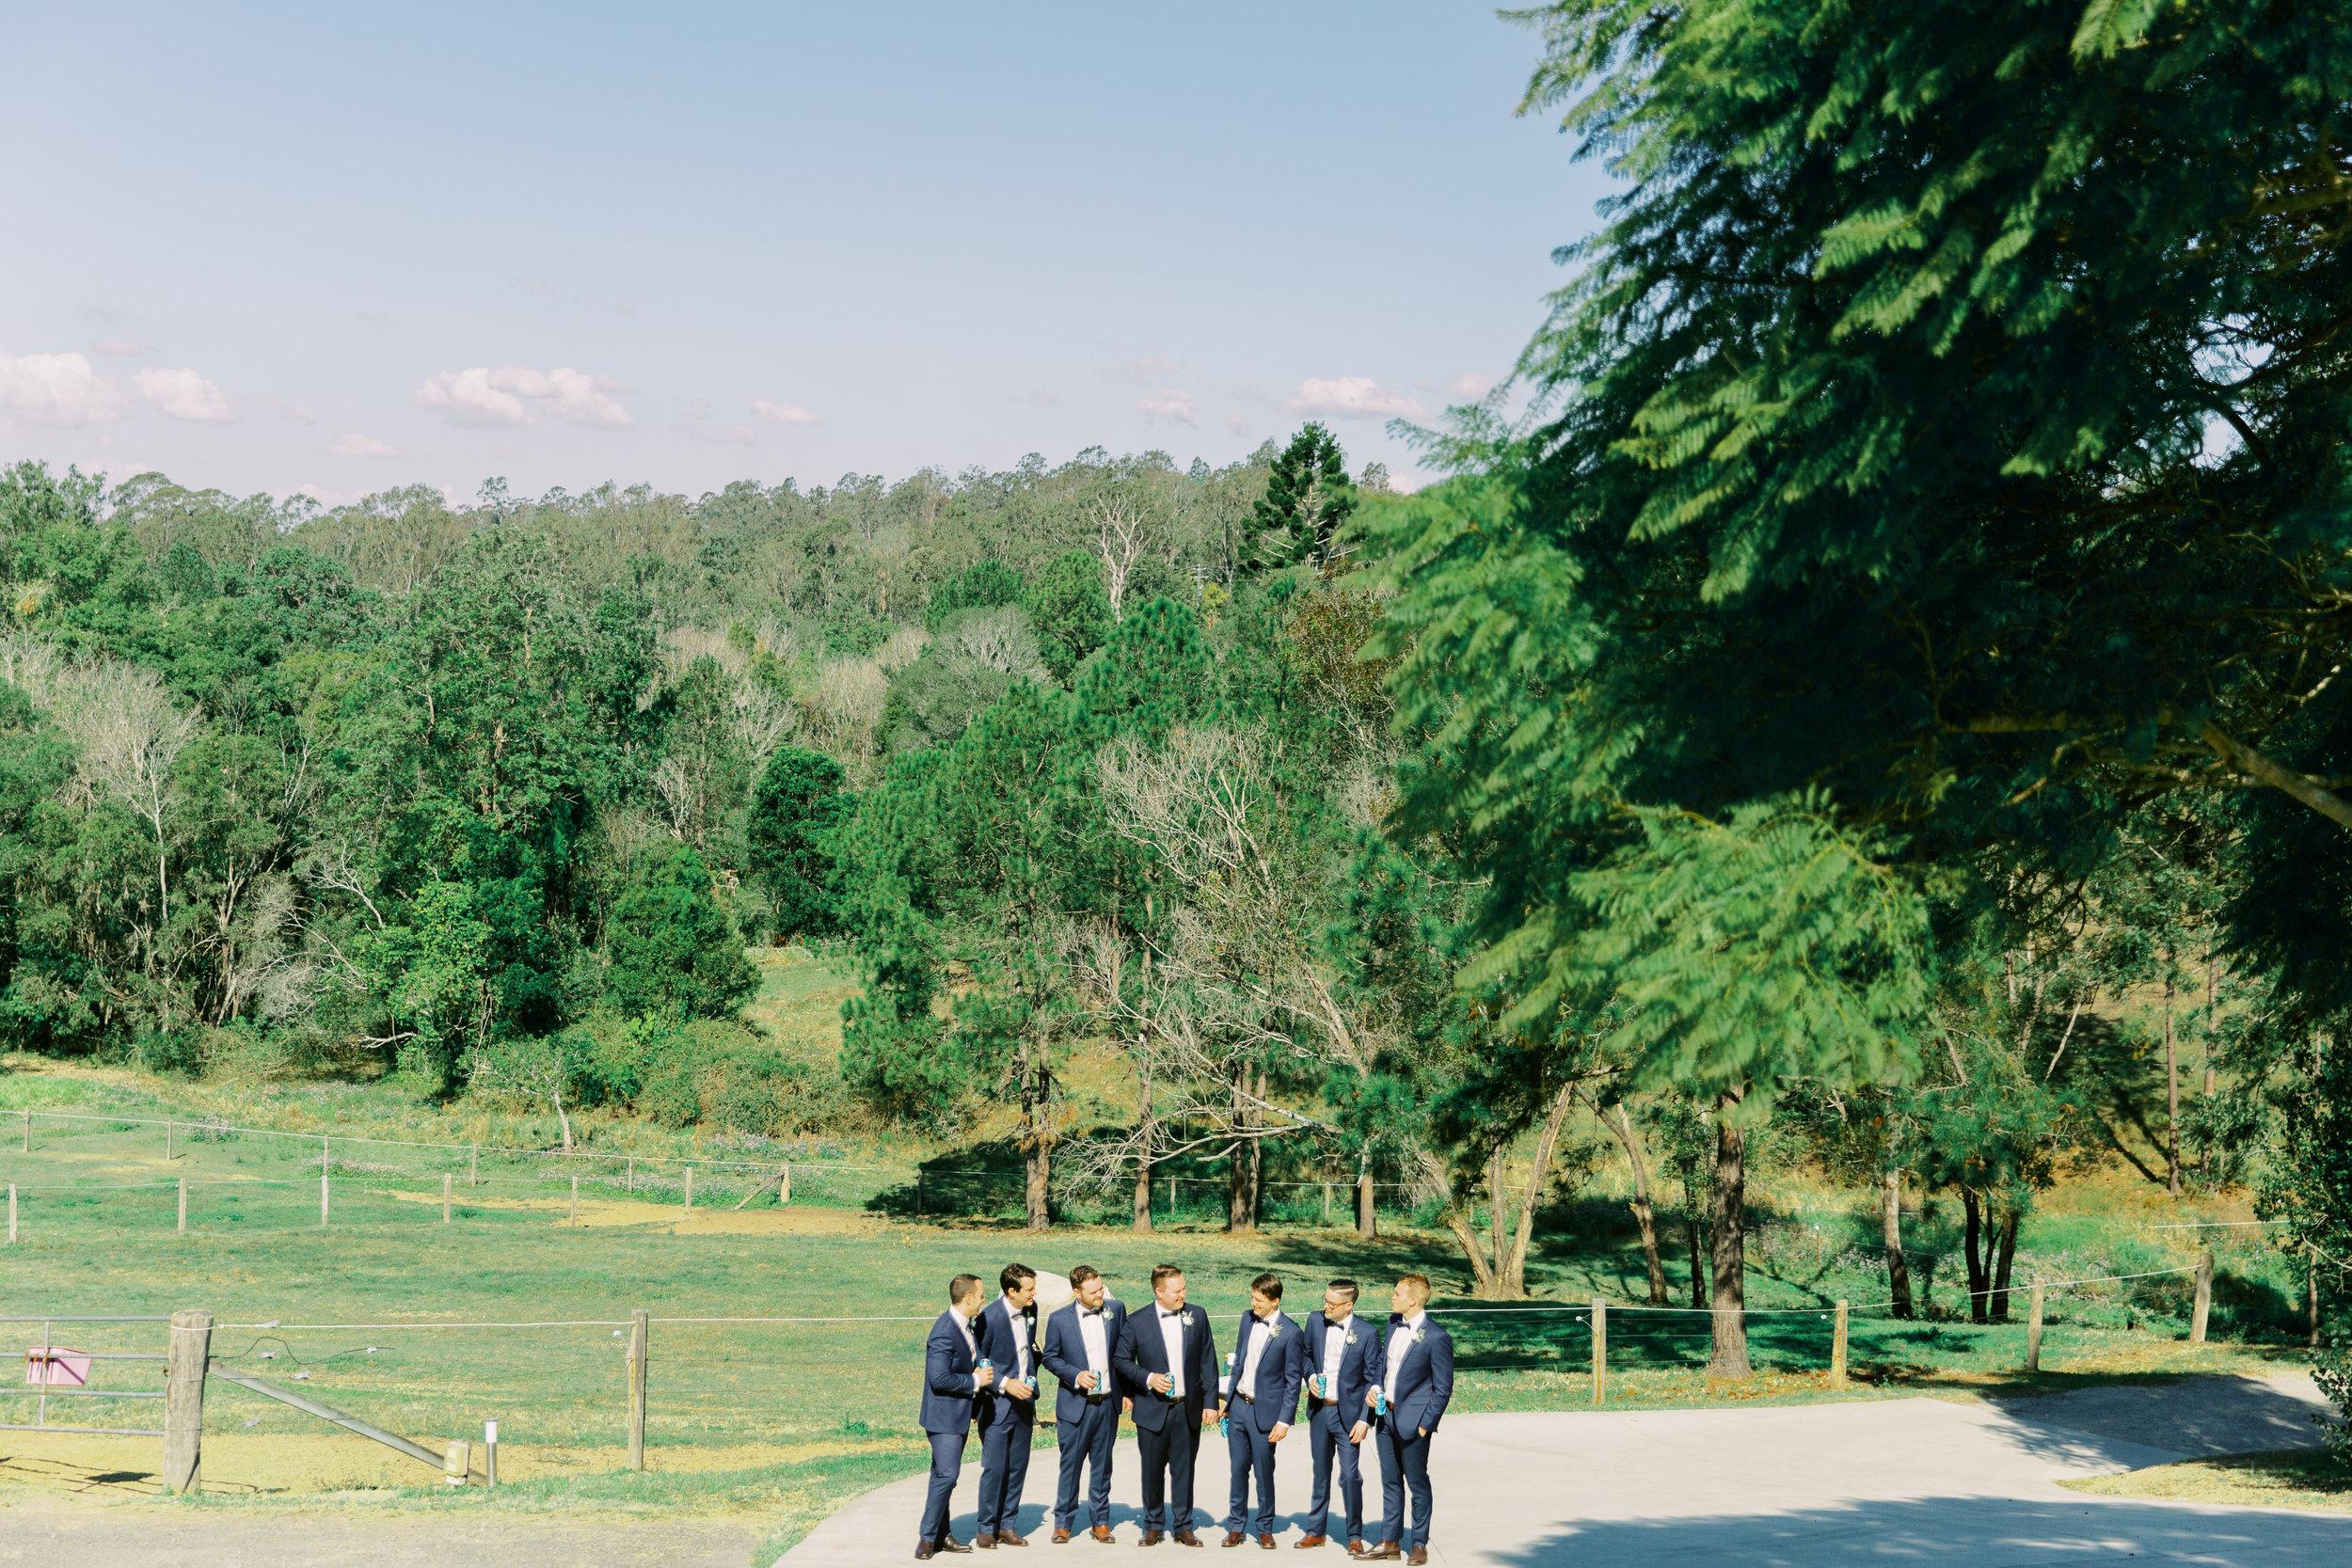 brisbane-gold-coast-sunshine-coast-tweed-romantic-fine-art-wedding-photography-lauren-olivia-19.jpg